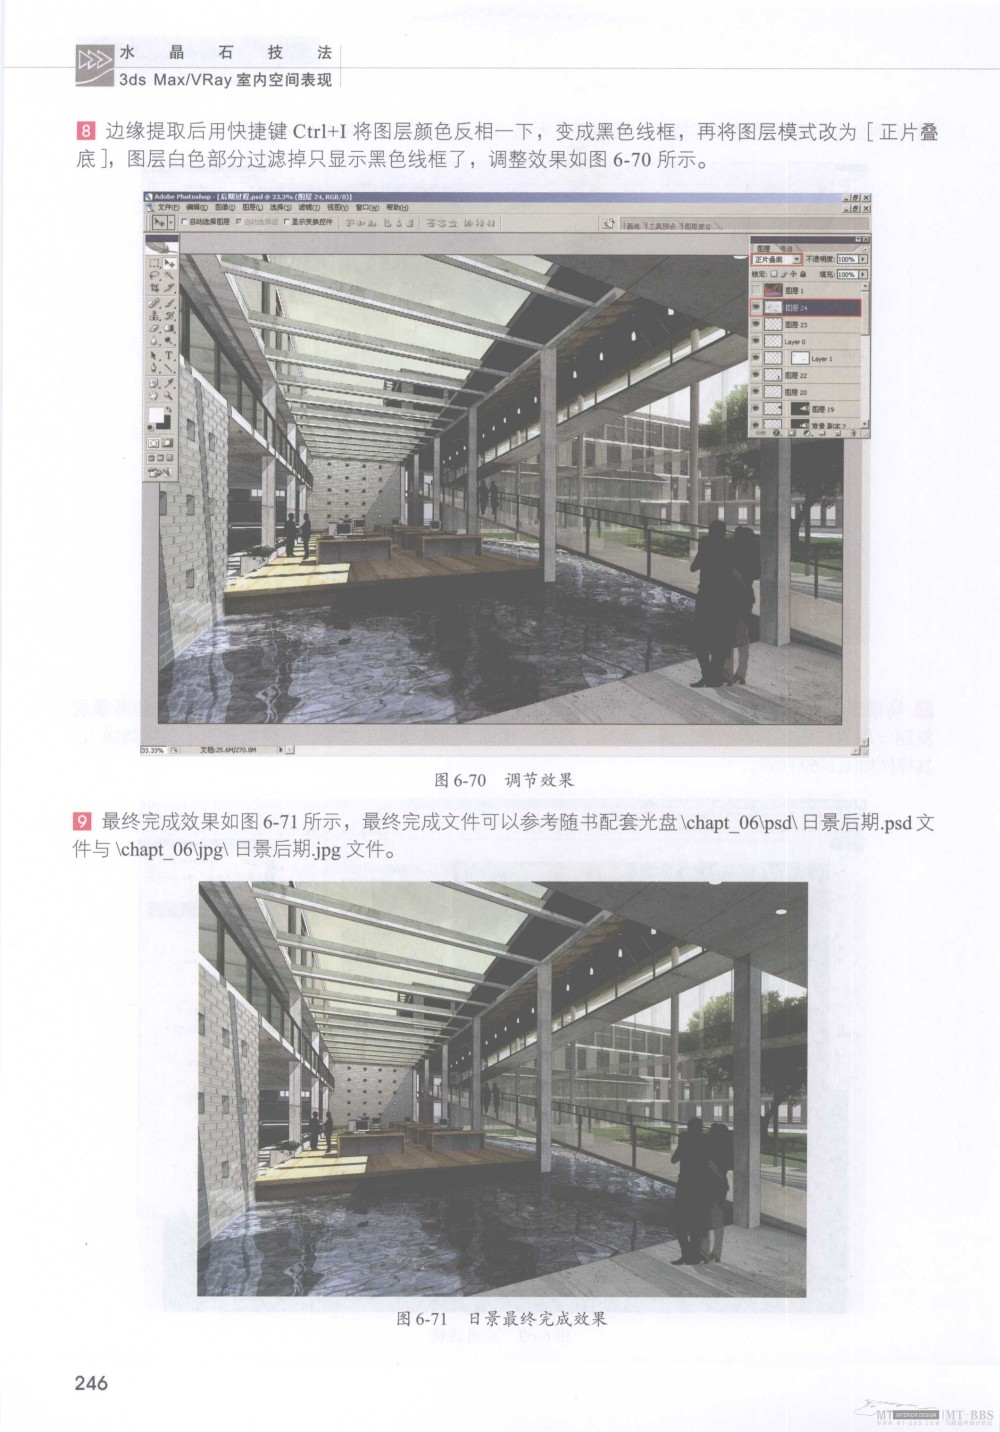 水晶石技法-3ds_Max&VRay室内空间表现_水晶石技法-3ds_Max&VRay室内空间表现_页面_252.jpg